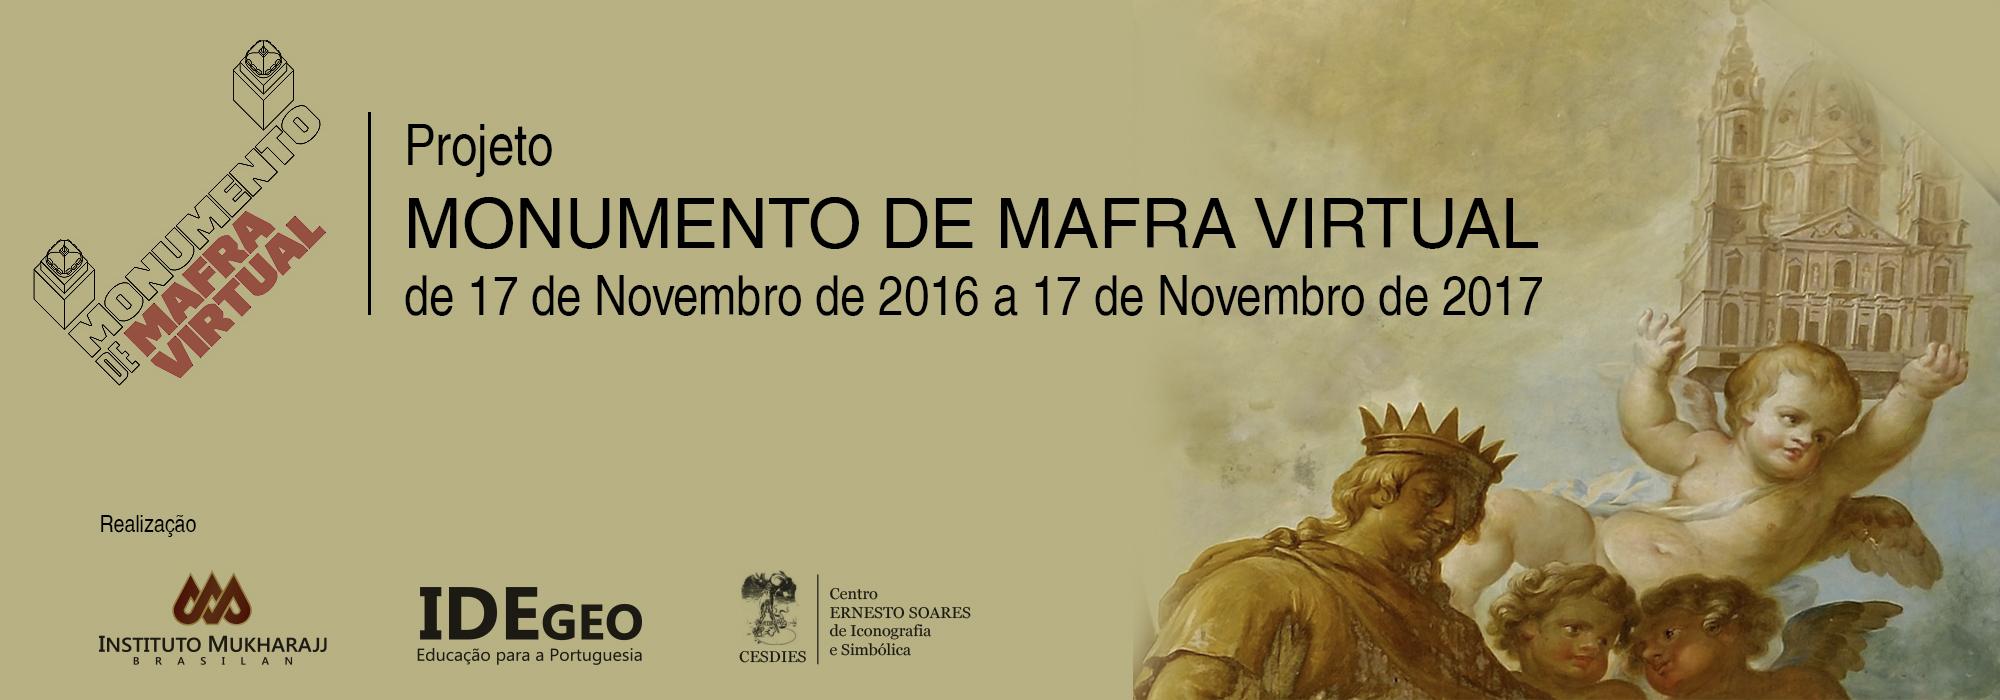 banner-site-monumento-de-mafra-virtual